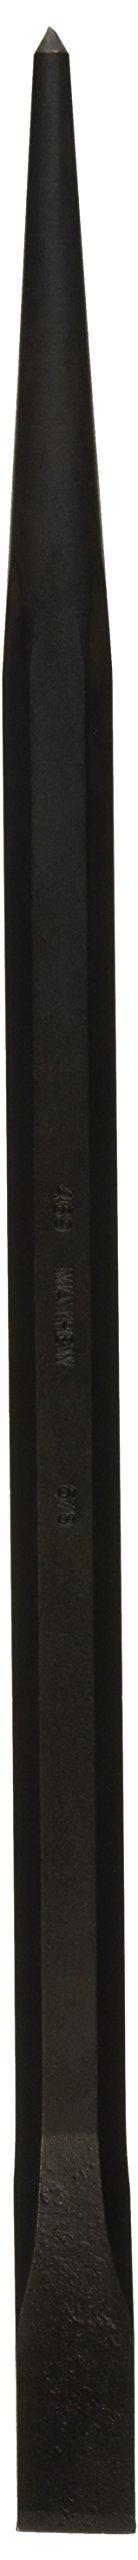 Mayhew Pro 40001 16-Inch Line-Up Pry Bar